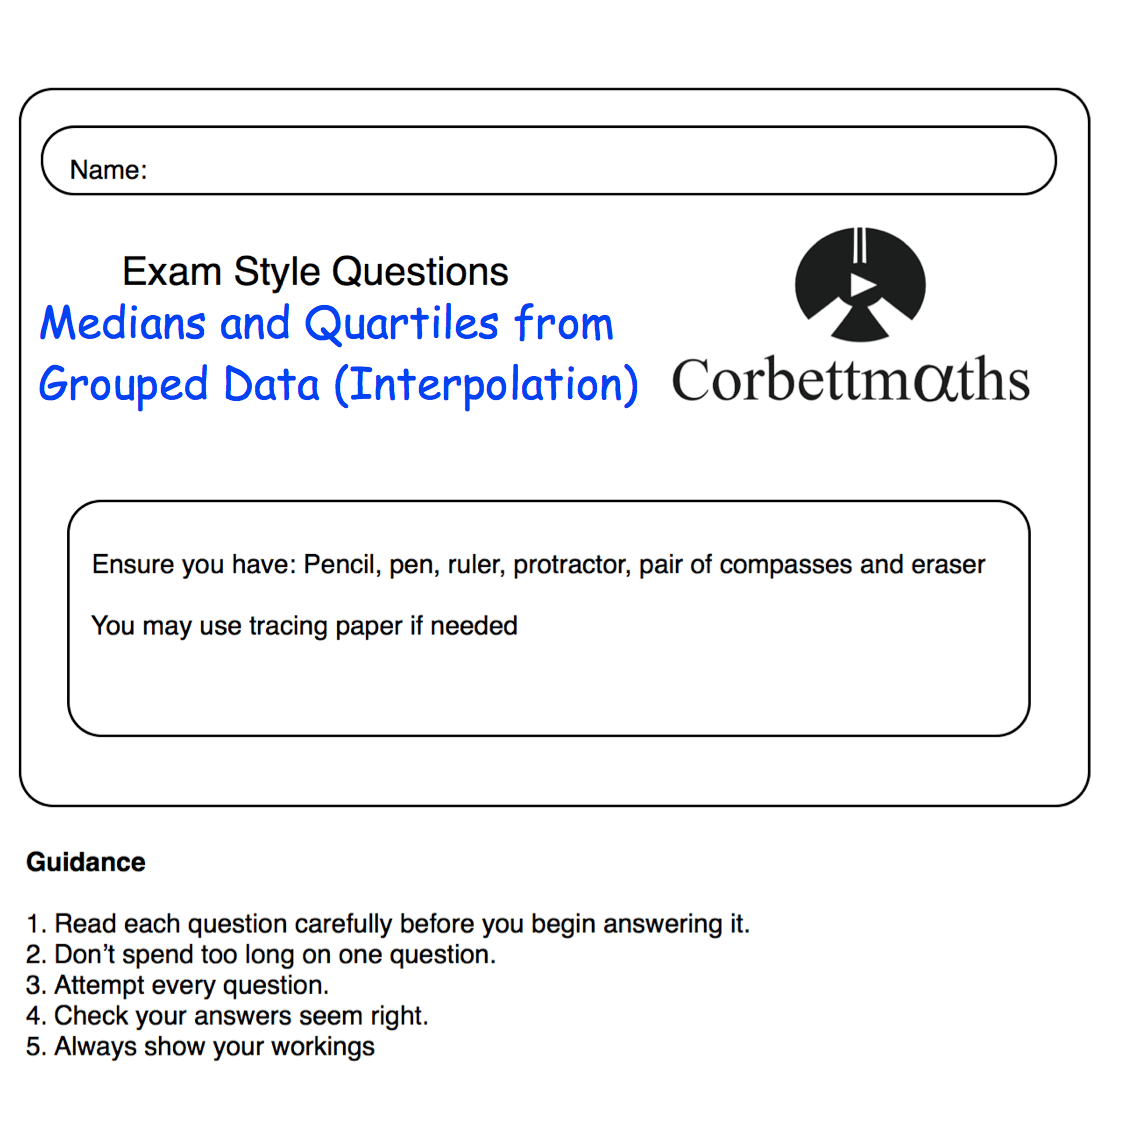 Pq Medians Quartiles From Grouped Data Corbettmaths